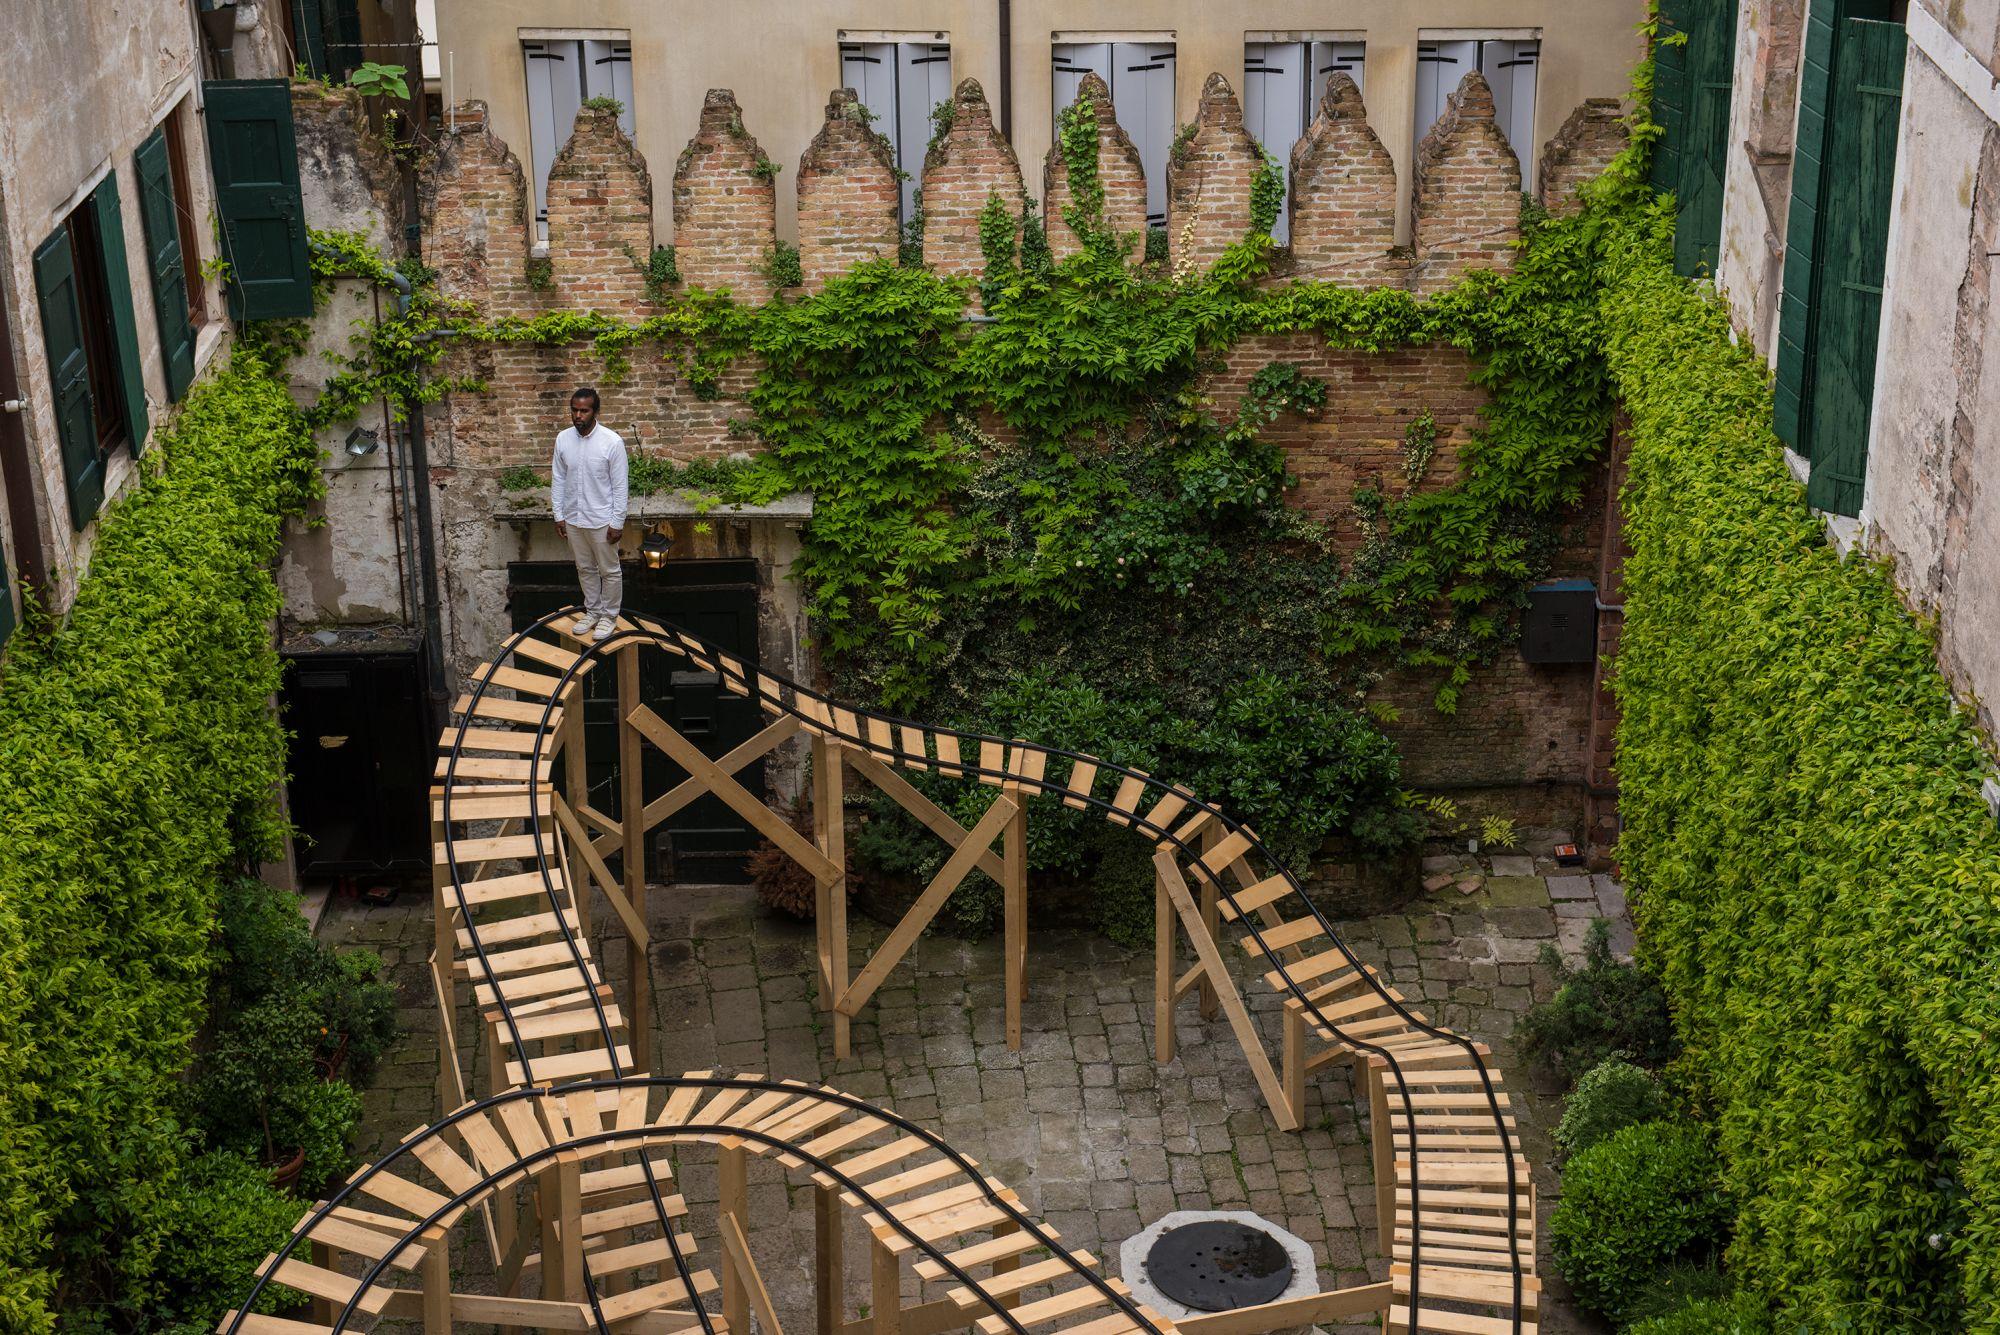 Future Generation Art Prize, 57th Venice Biennale